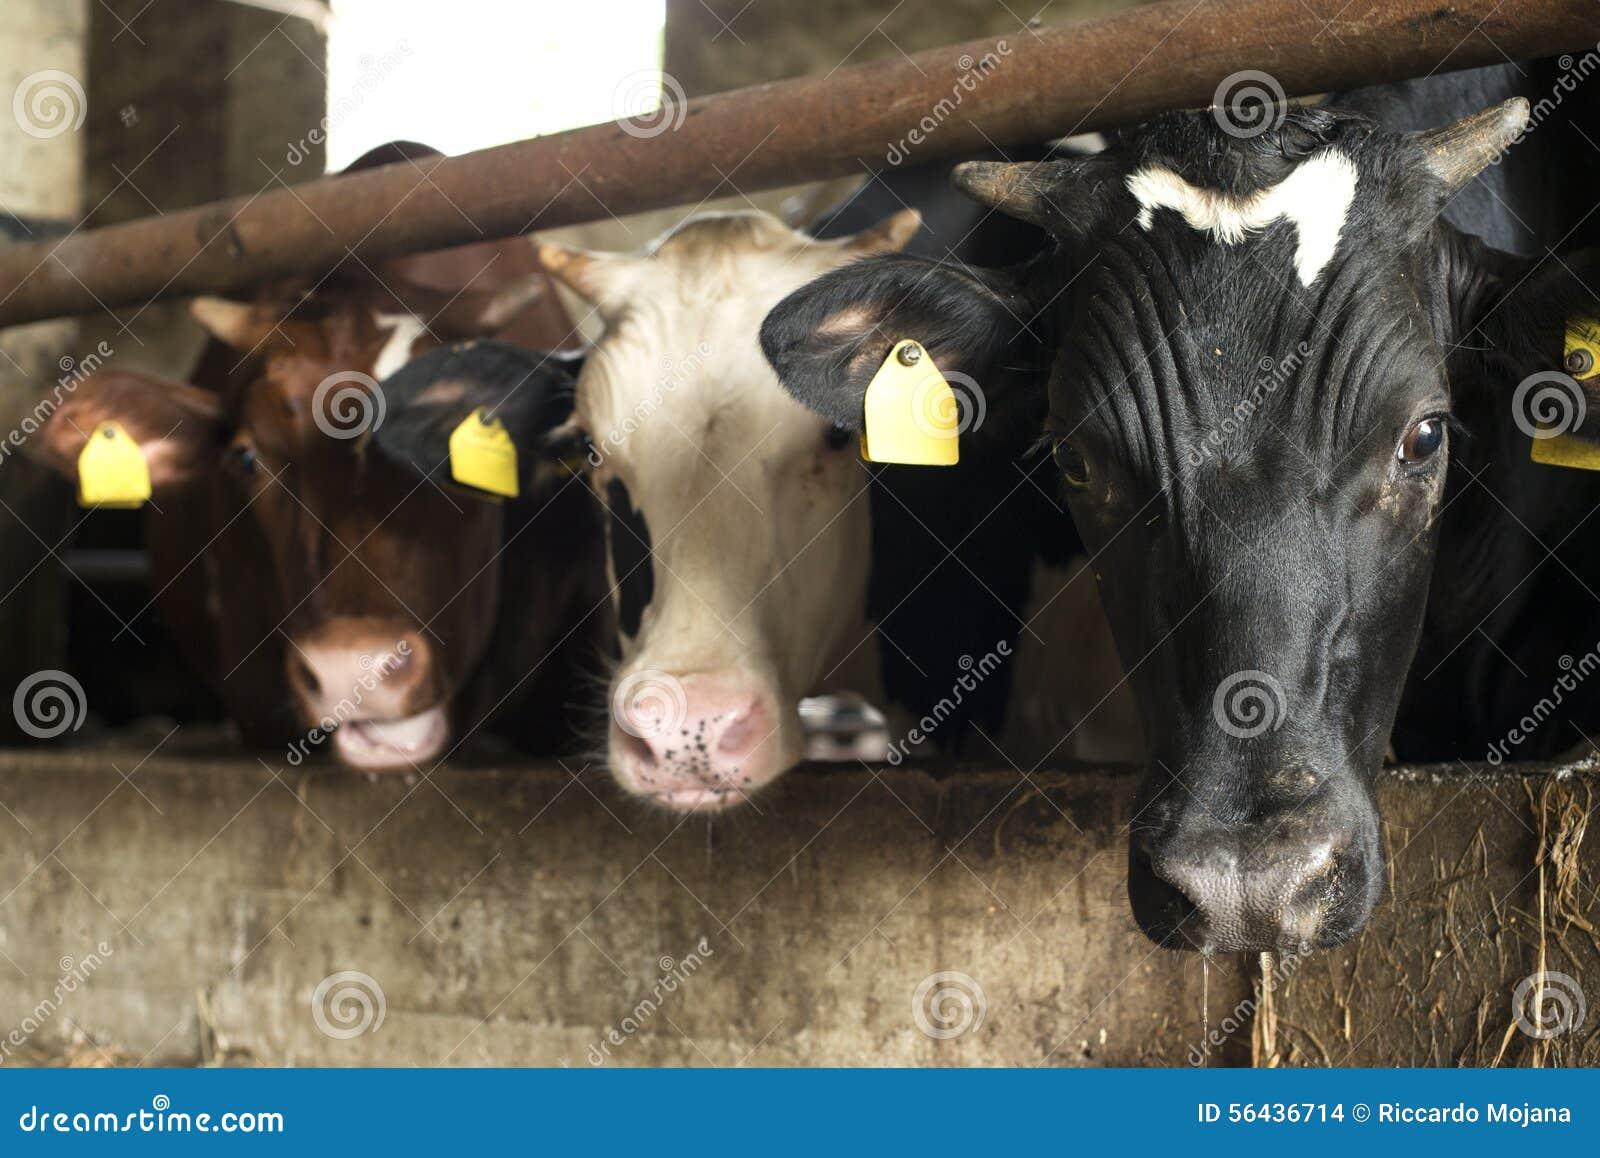 Cows in farm